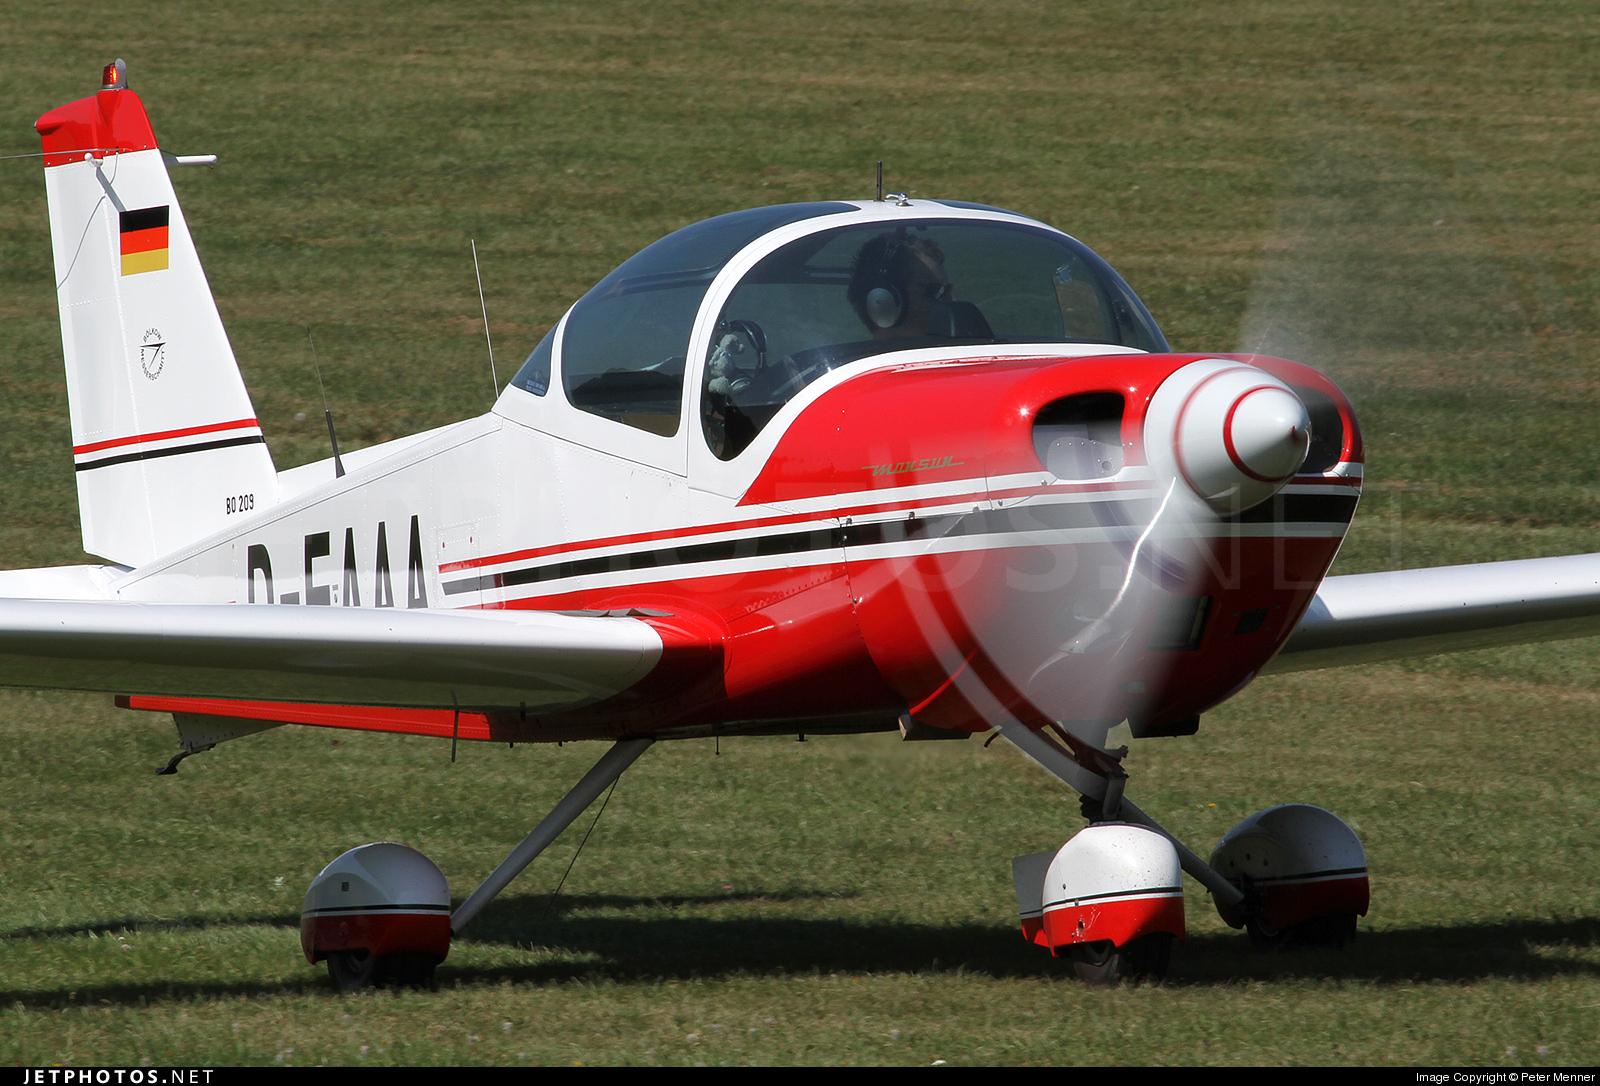 D-EAAA - Bolkow Bo.209 Monsun 150RV - Private